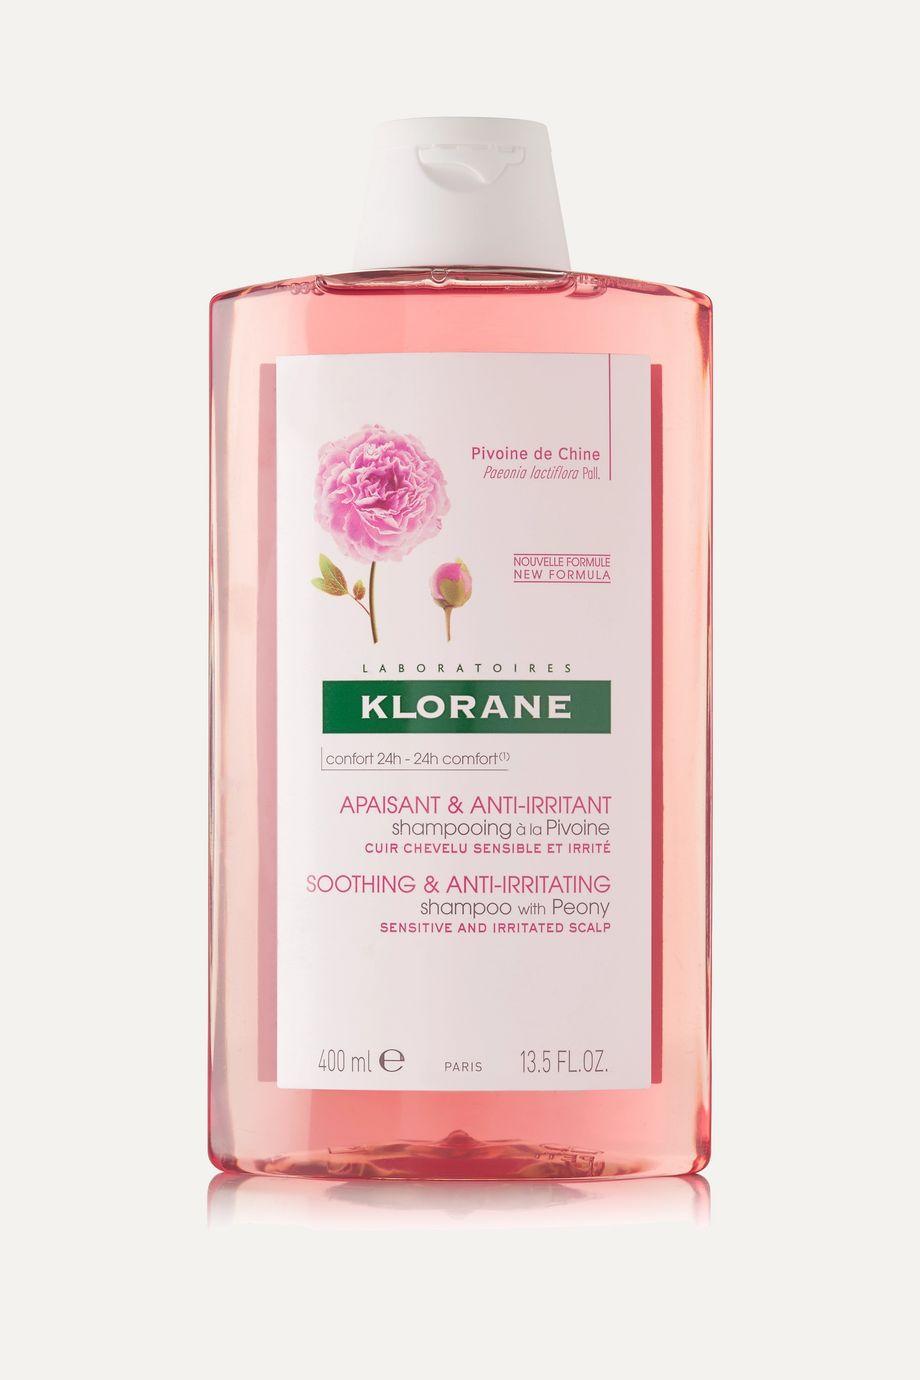 Klorane Shampoo With Peony, 400ml